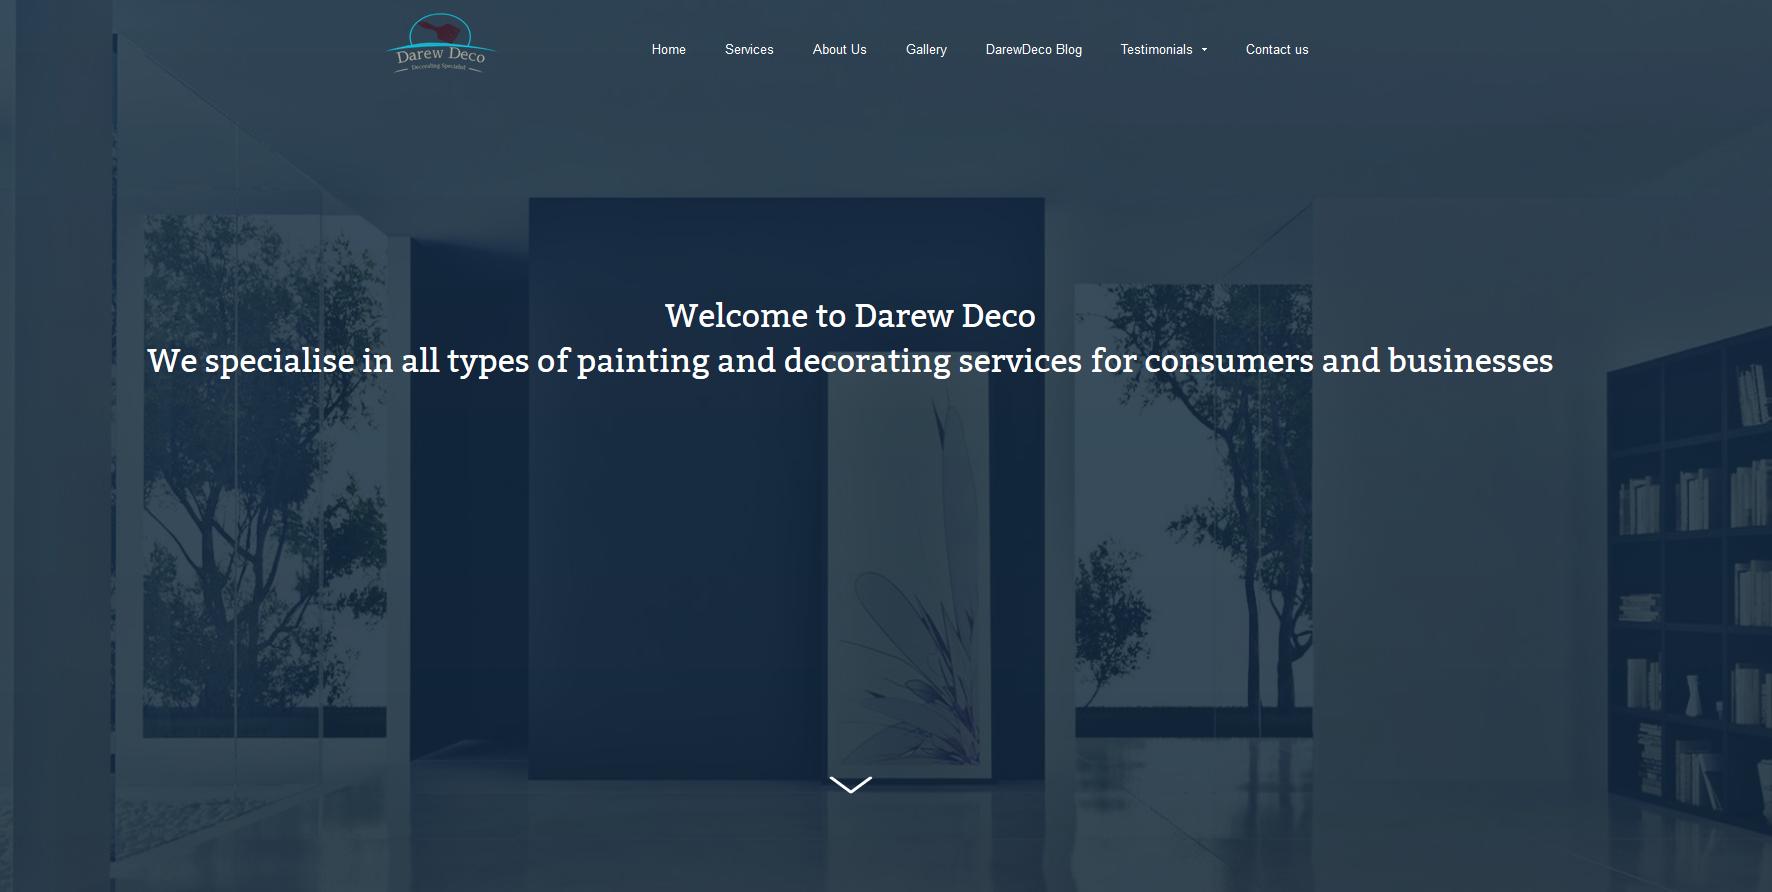 darewdeco.co.uk